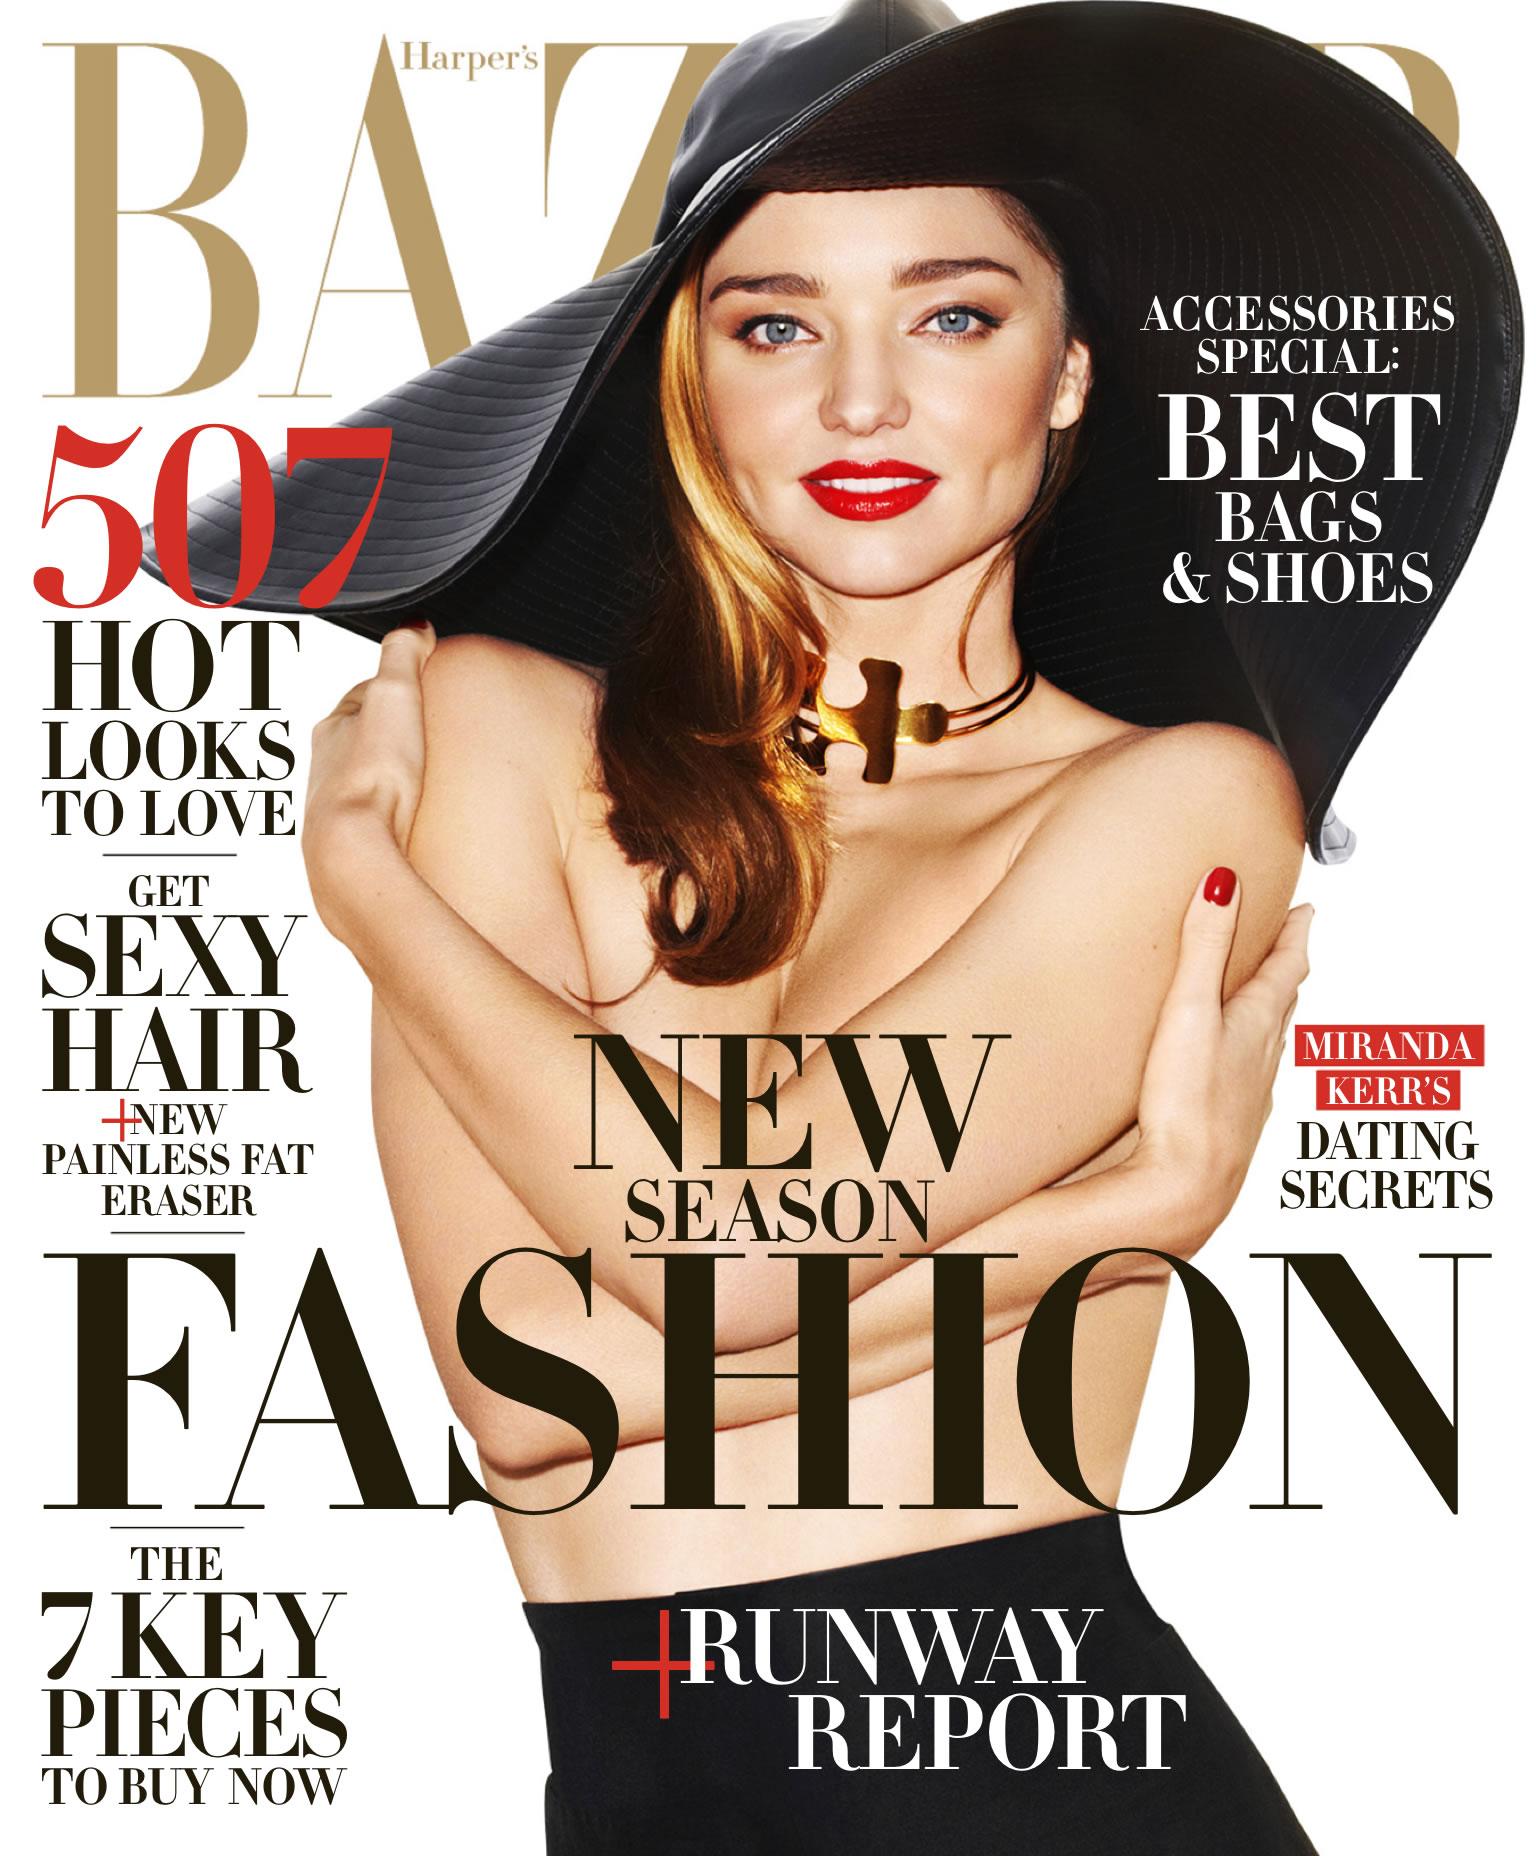 Miranda Kerr出镜《Harper's Bazaar》2015年2月美国版杂志  掌镜摄影师 Terry Richardson